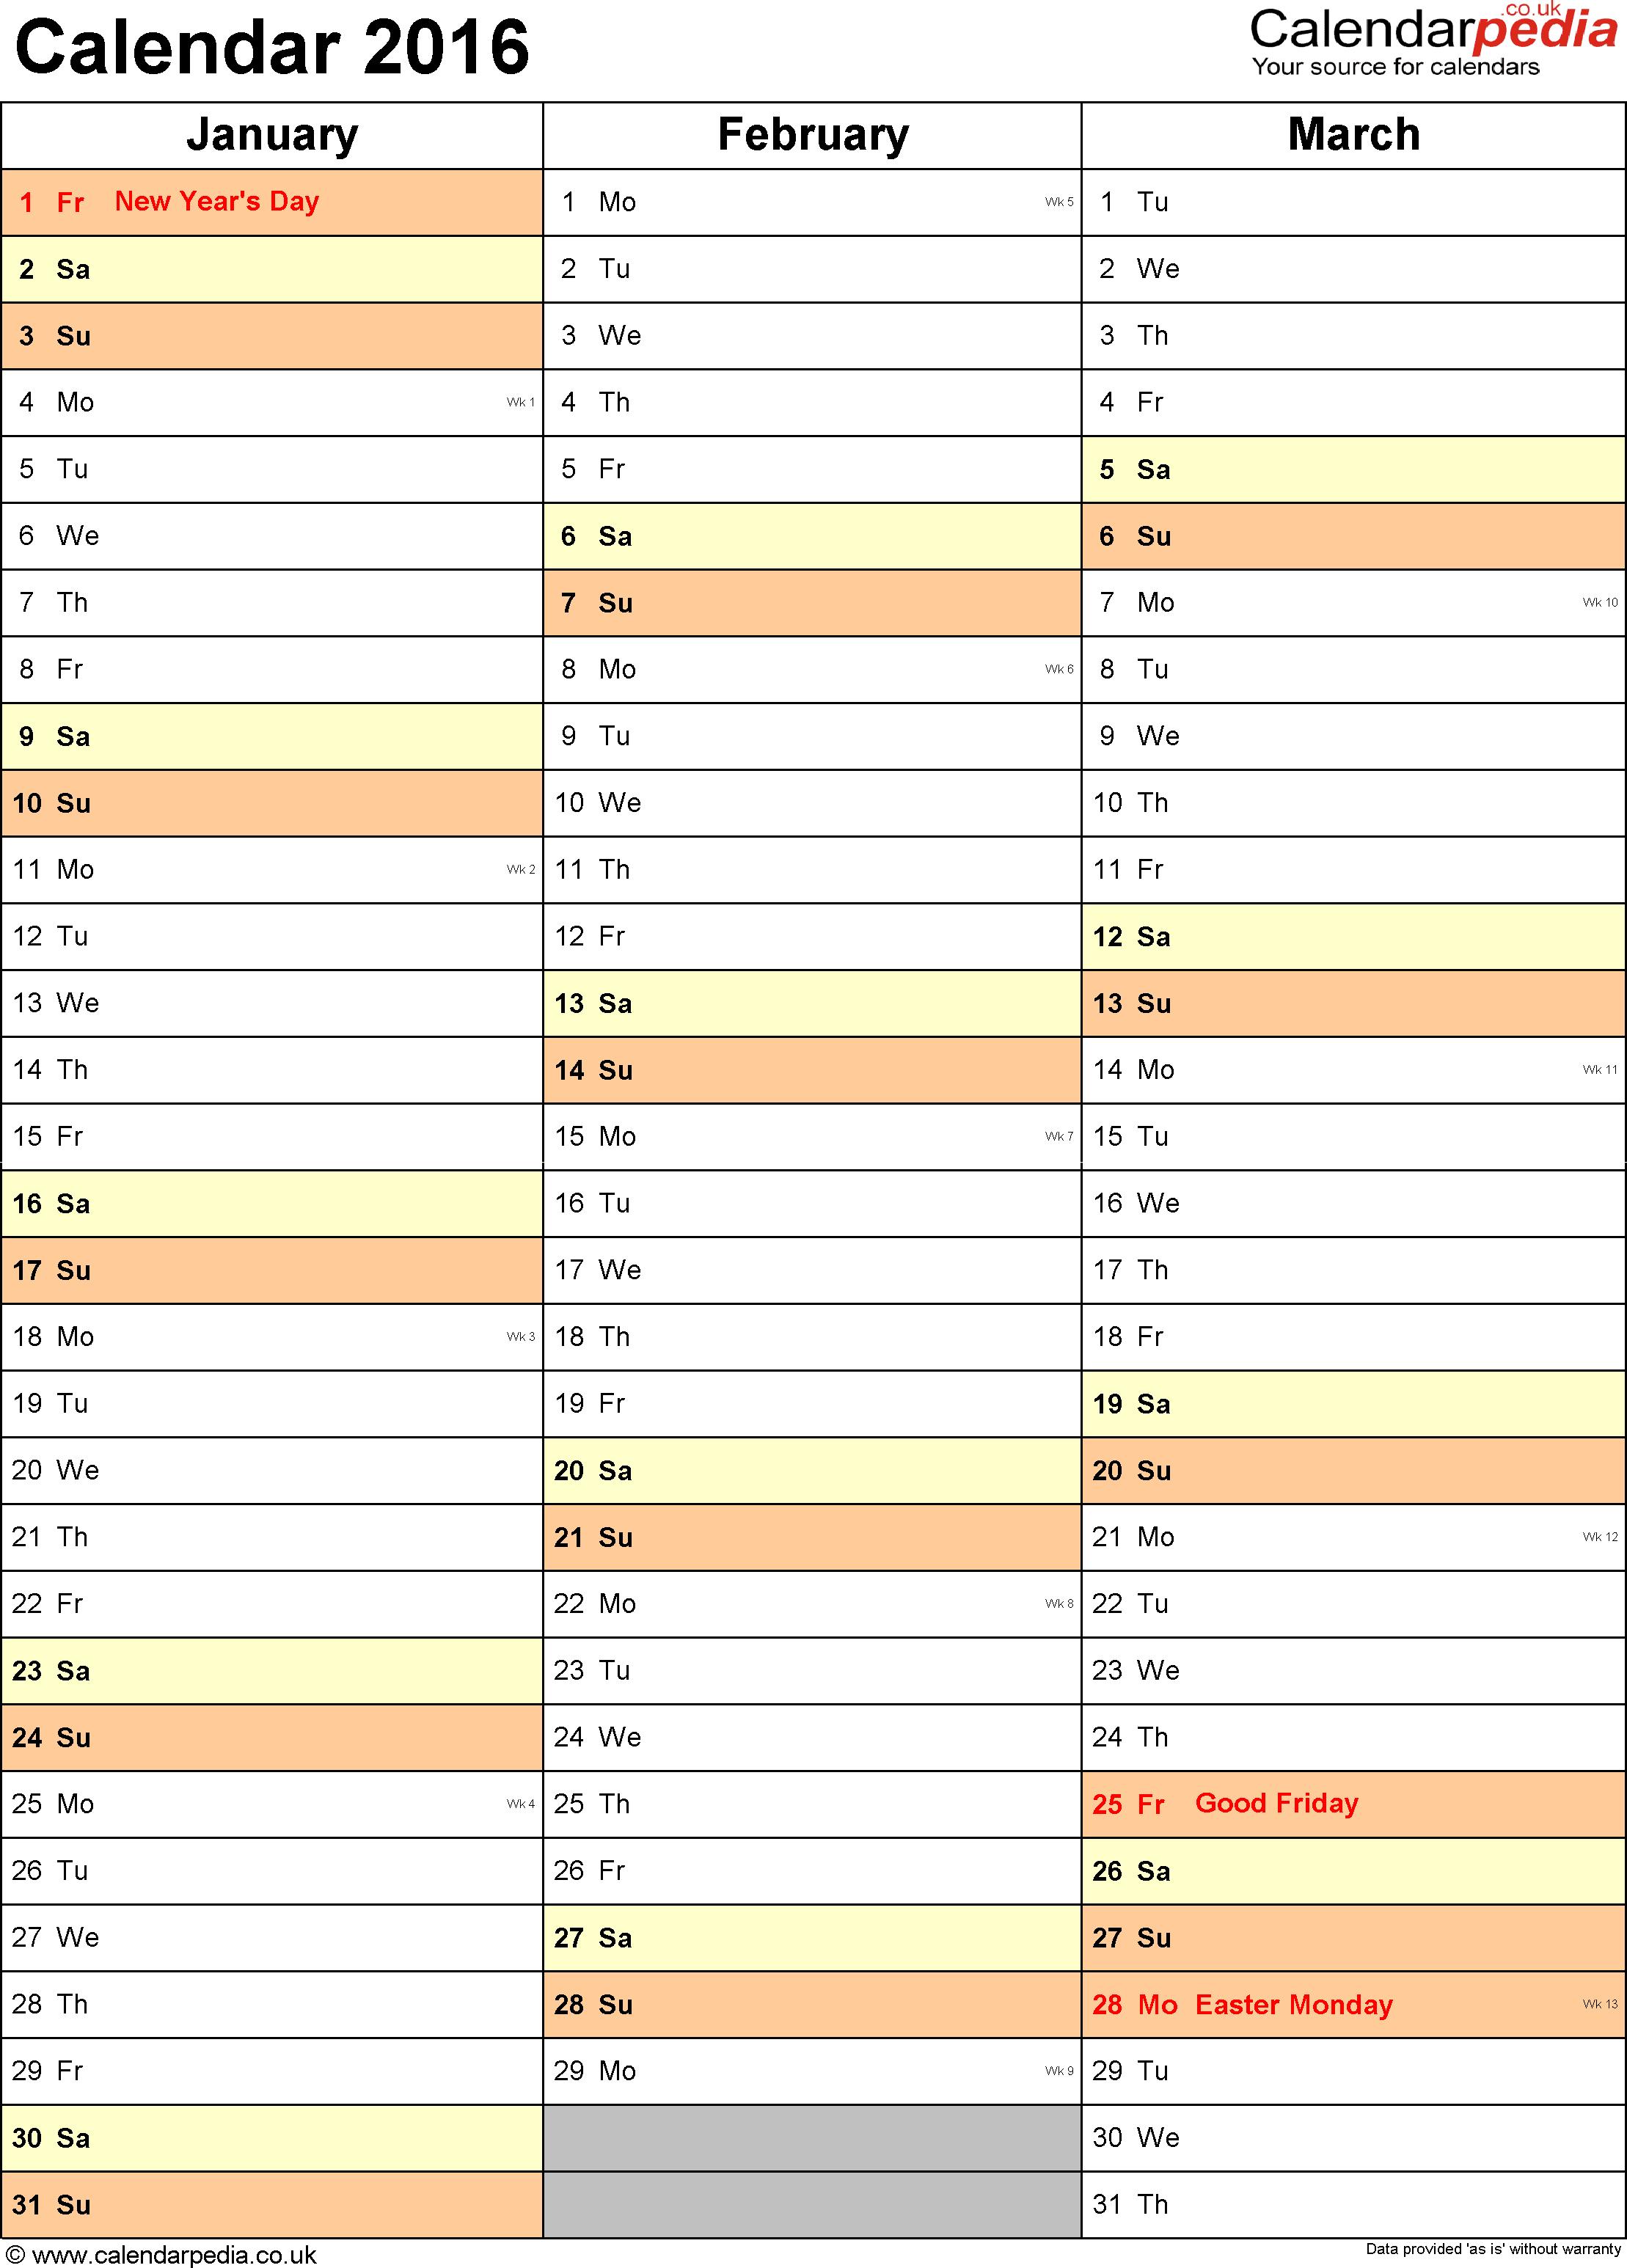 Calendar 2016 (UK) 16 free printable Word templates